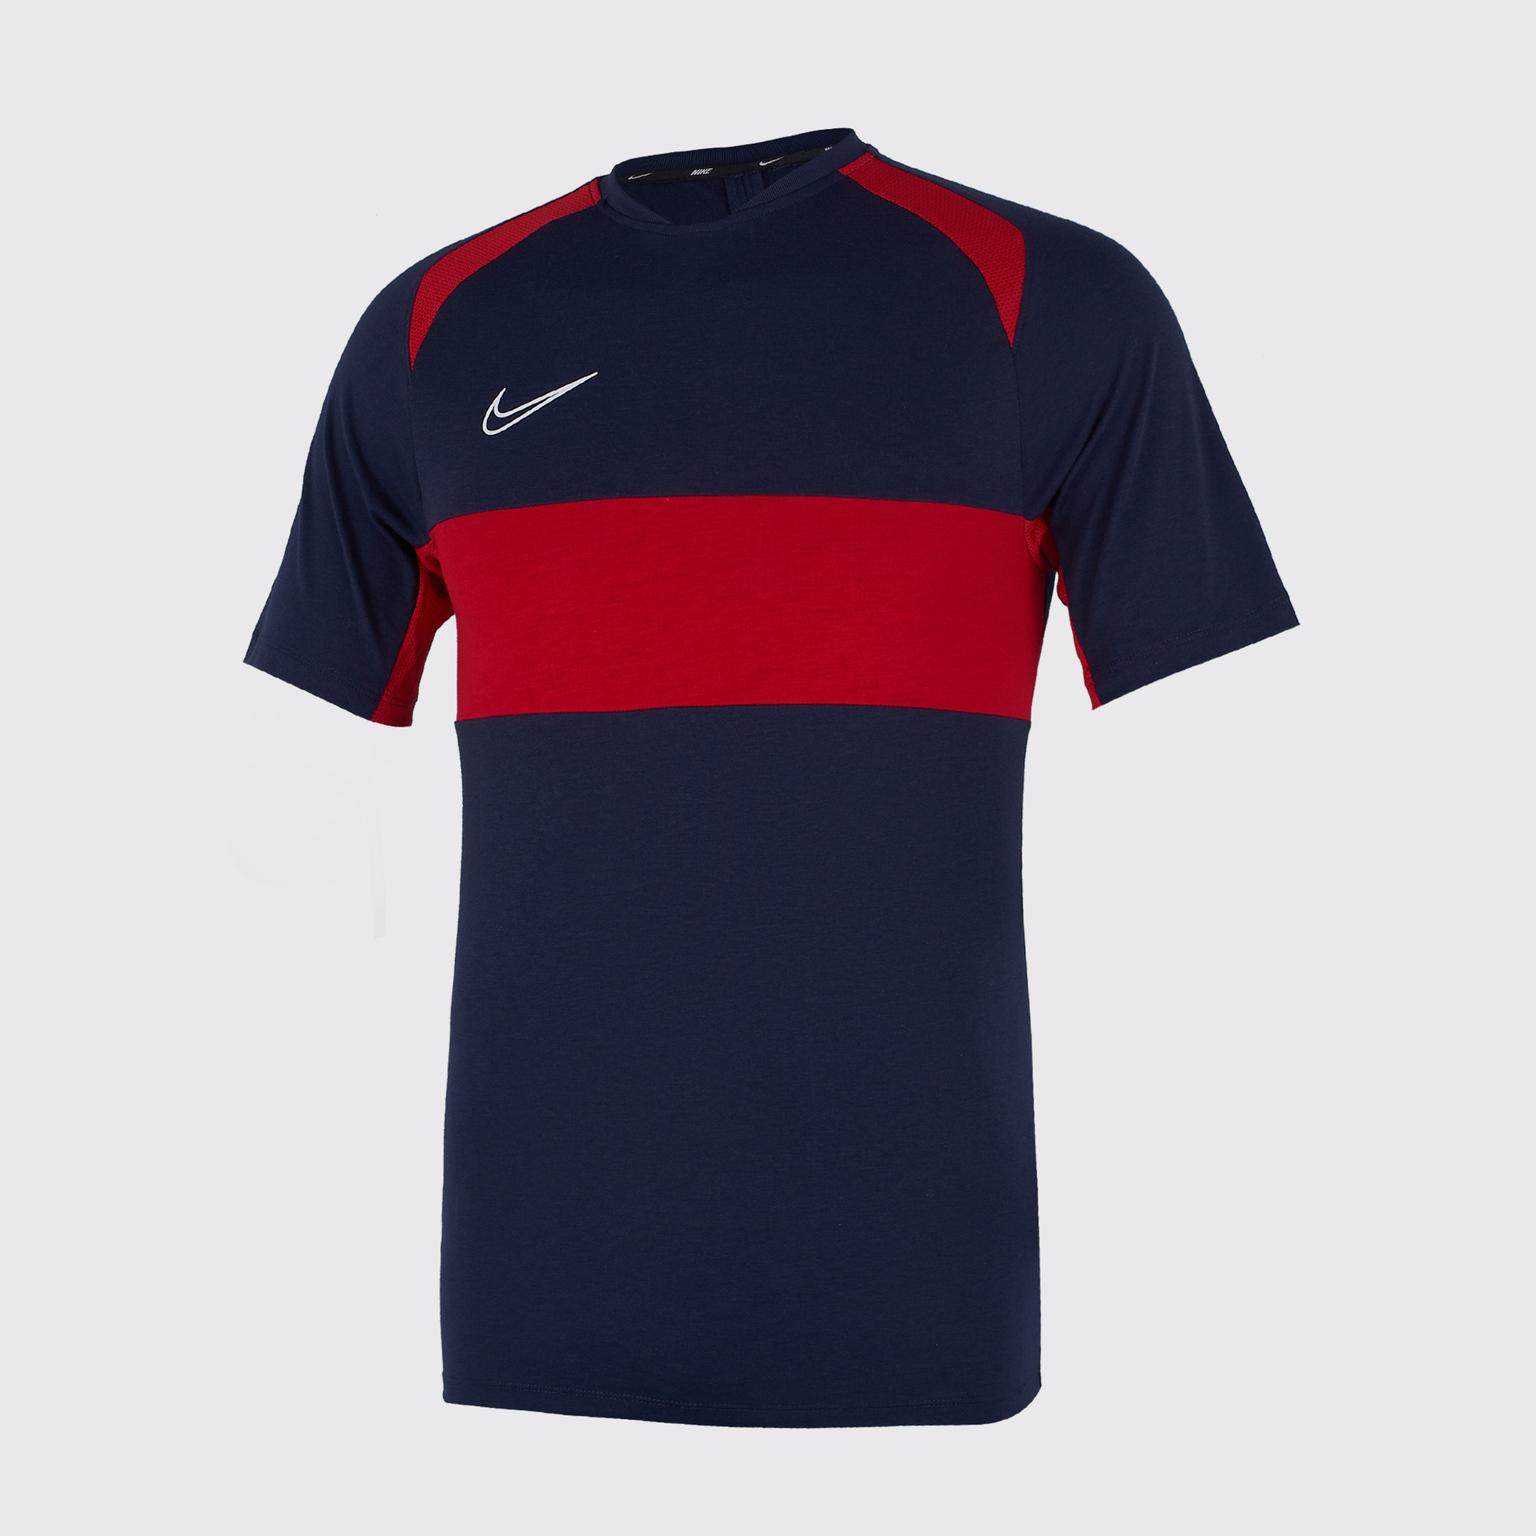 Футболка тренировочная Nike Dry Academy Top BQ7352-452 цена 2017